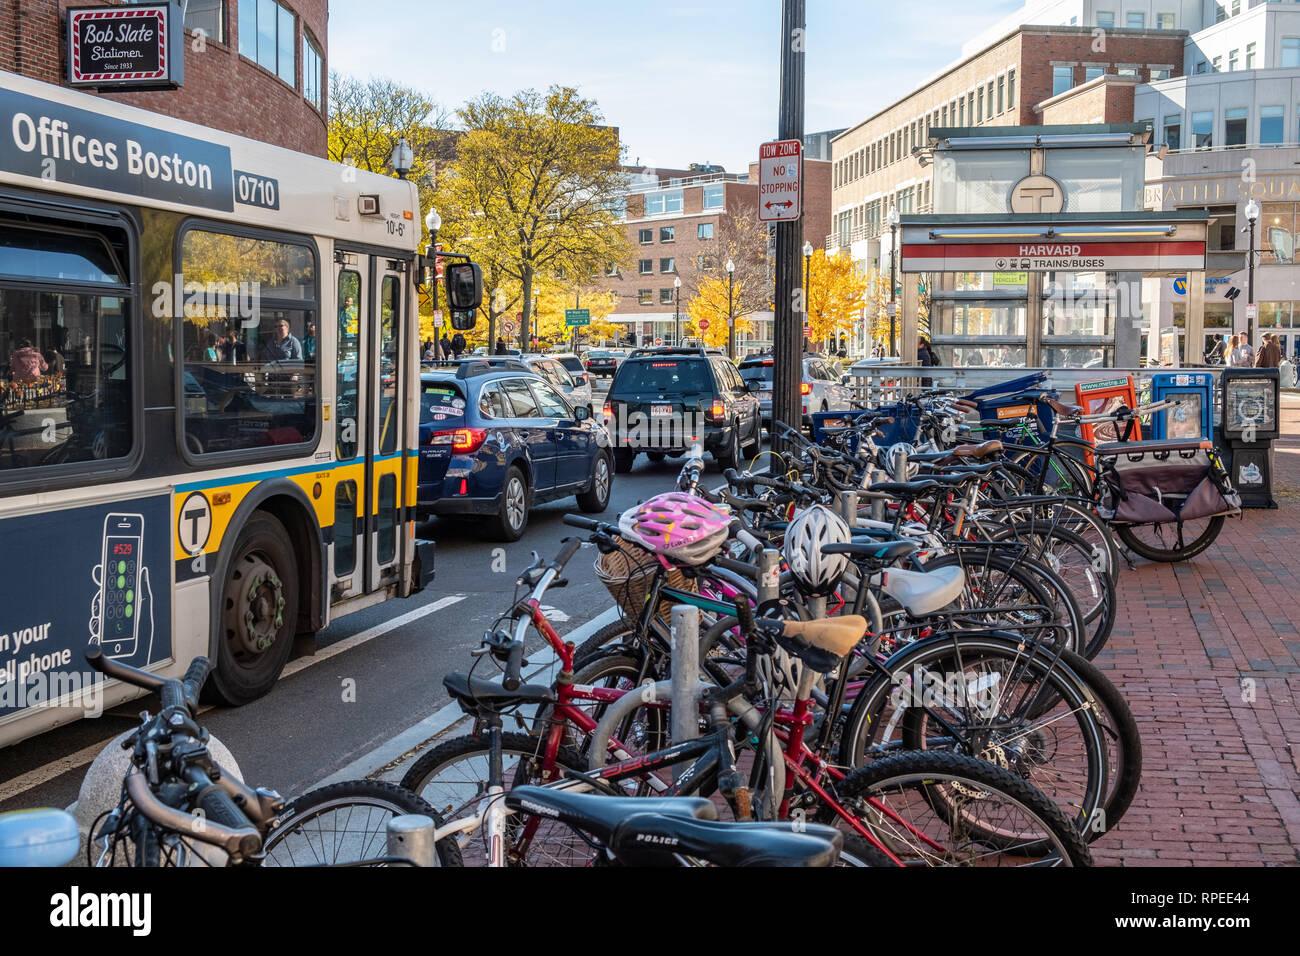 Heavy traffic congestion in Harvard Square in Cambridge, MA - Stock Image